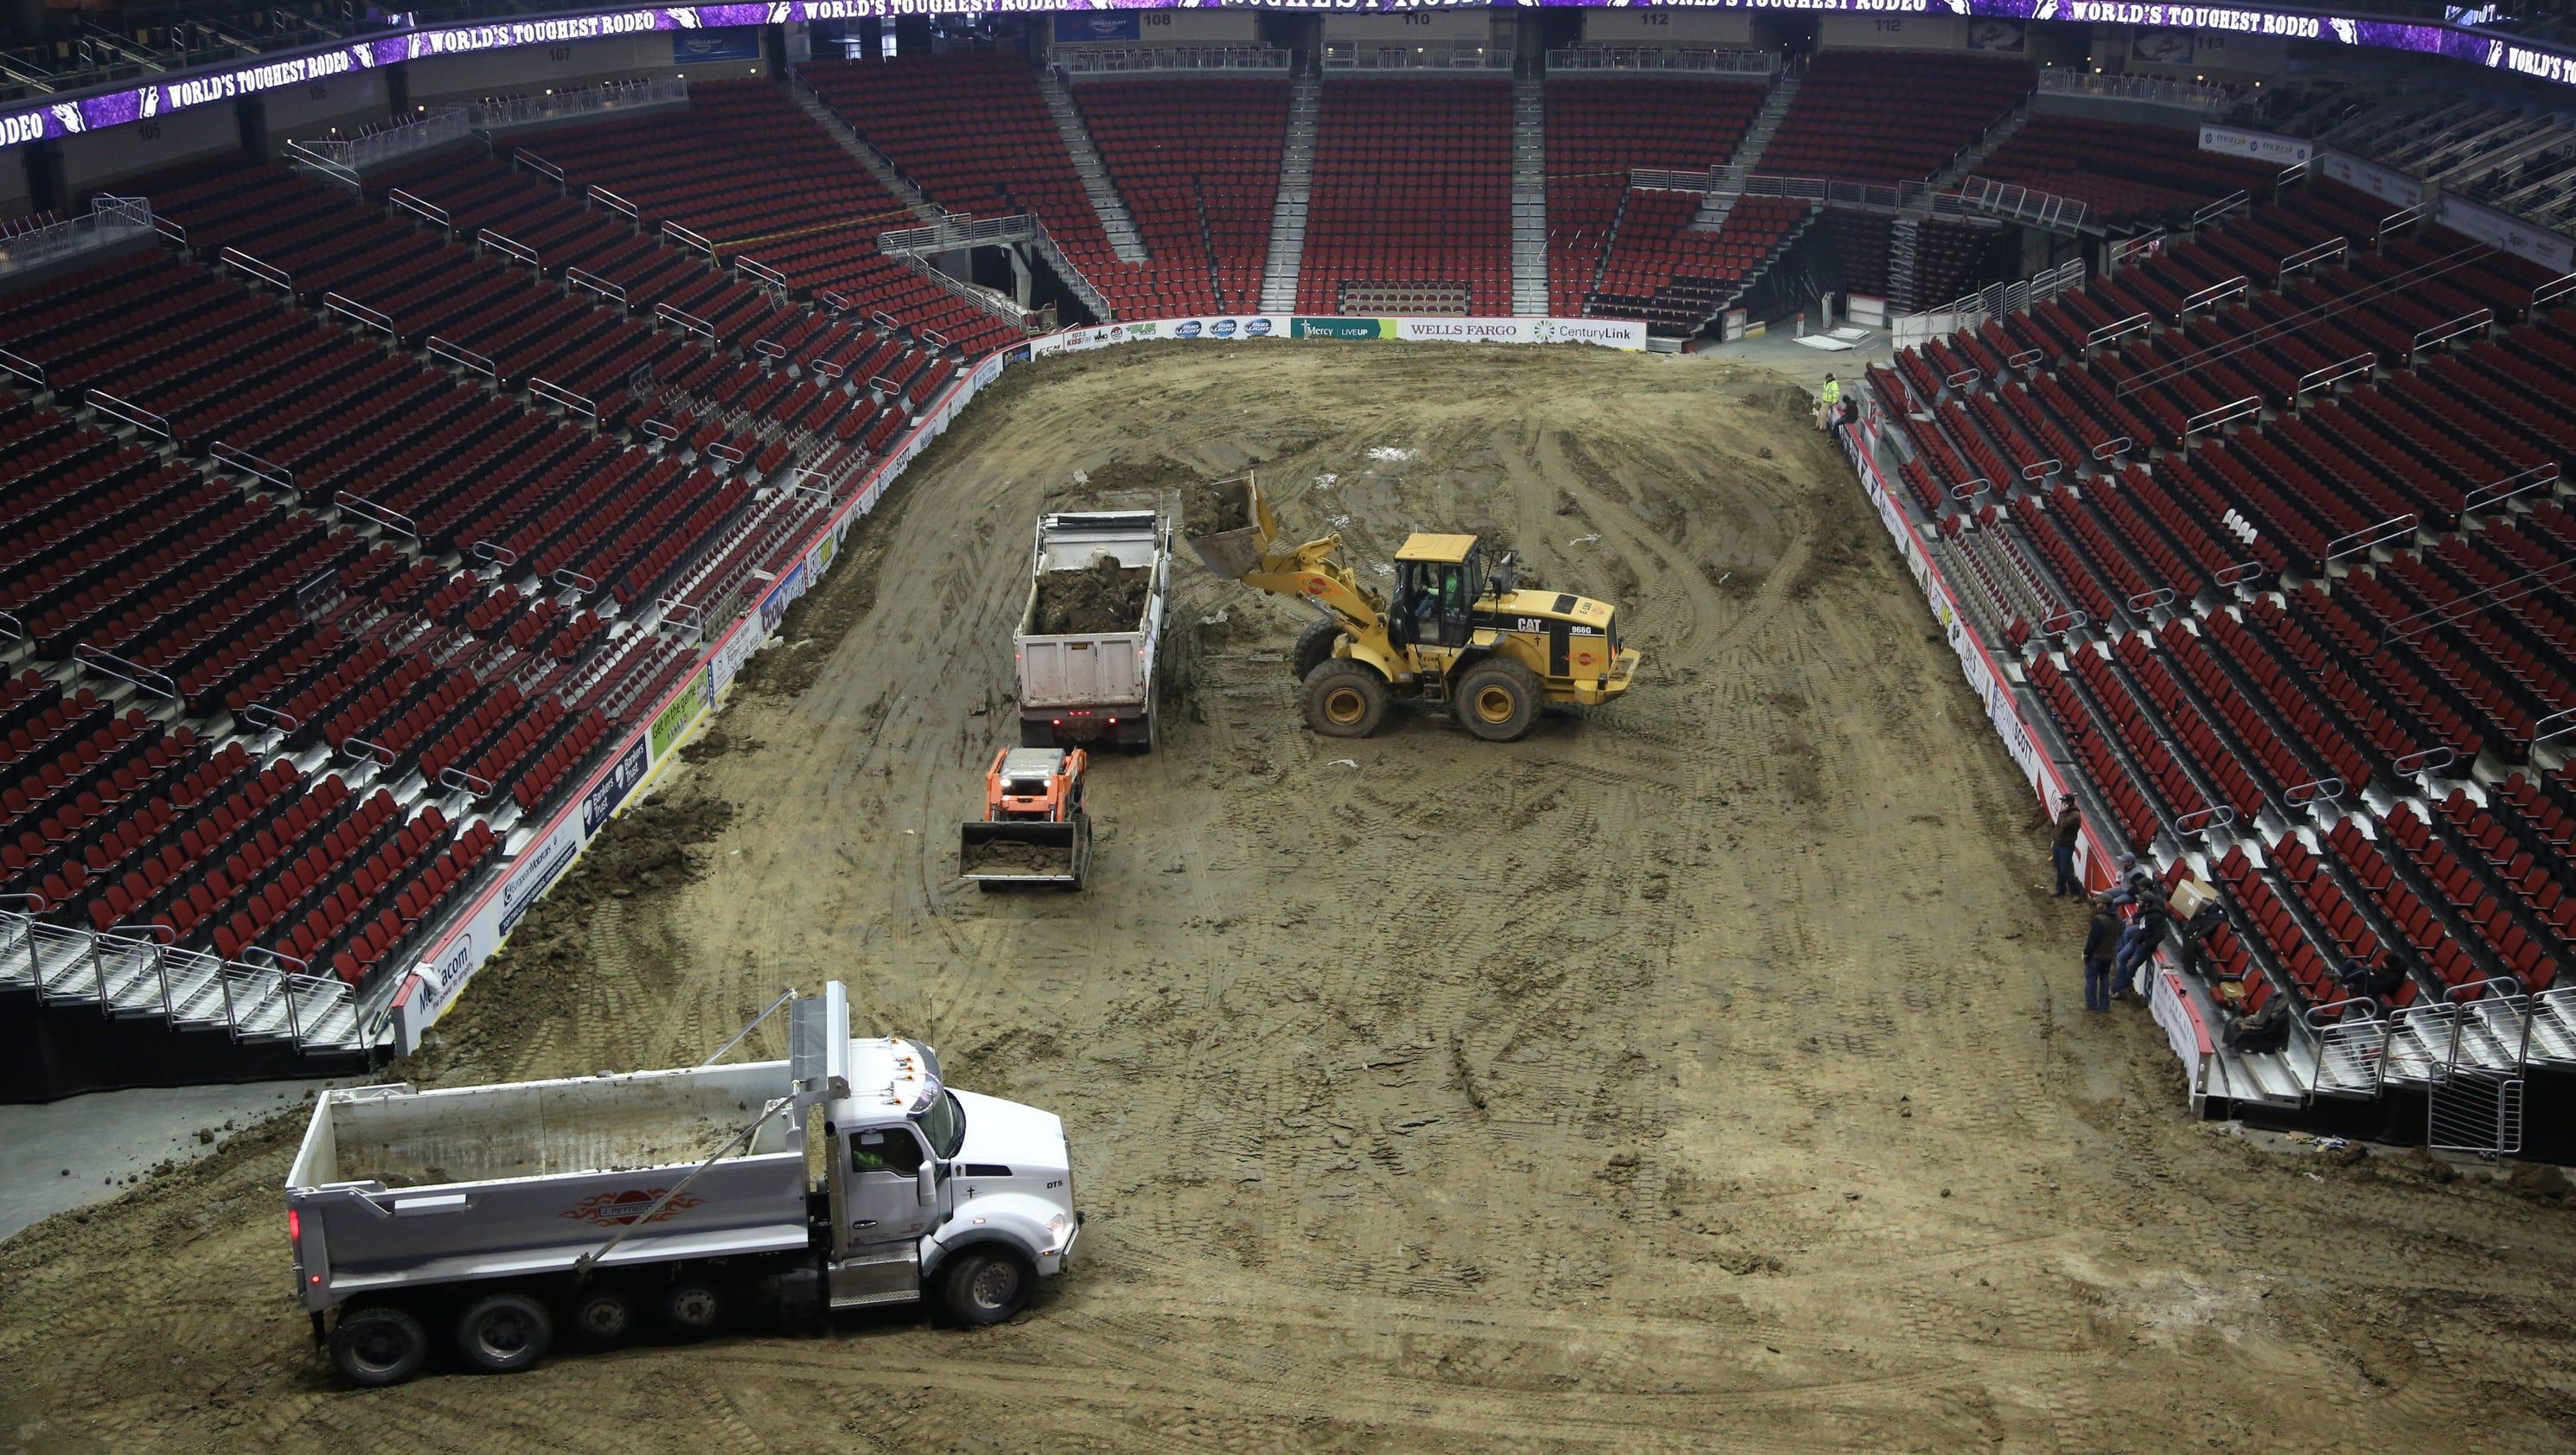 9 Photos World S Toughest Rodeo At Wells Fargo Arena